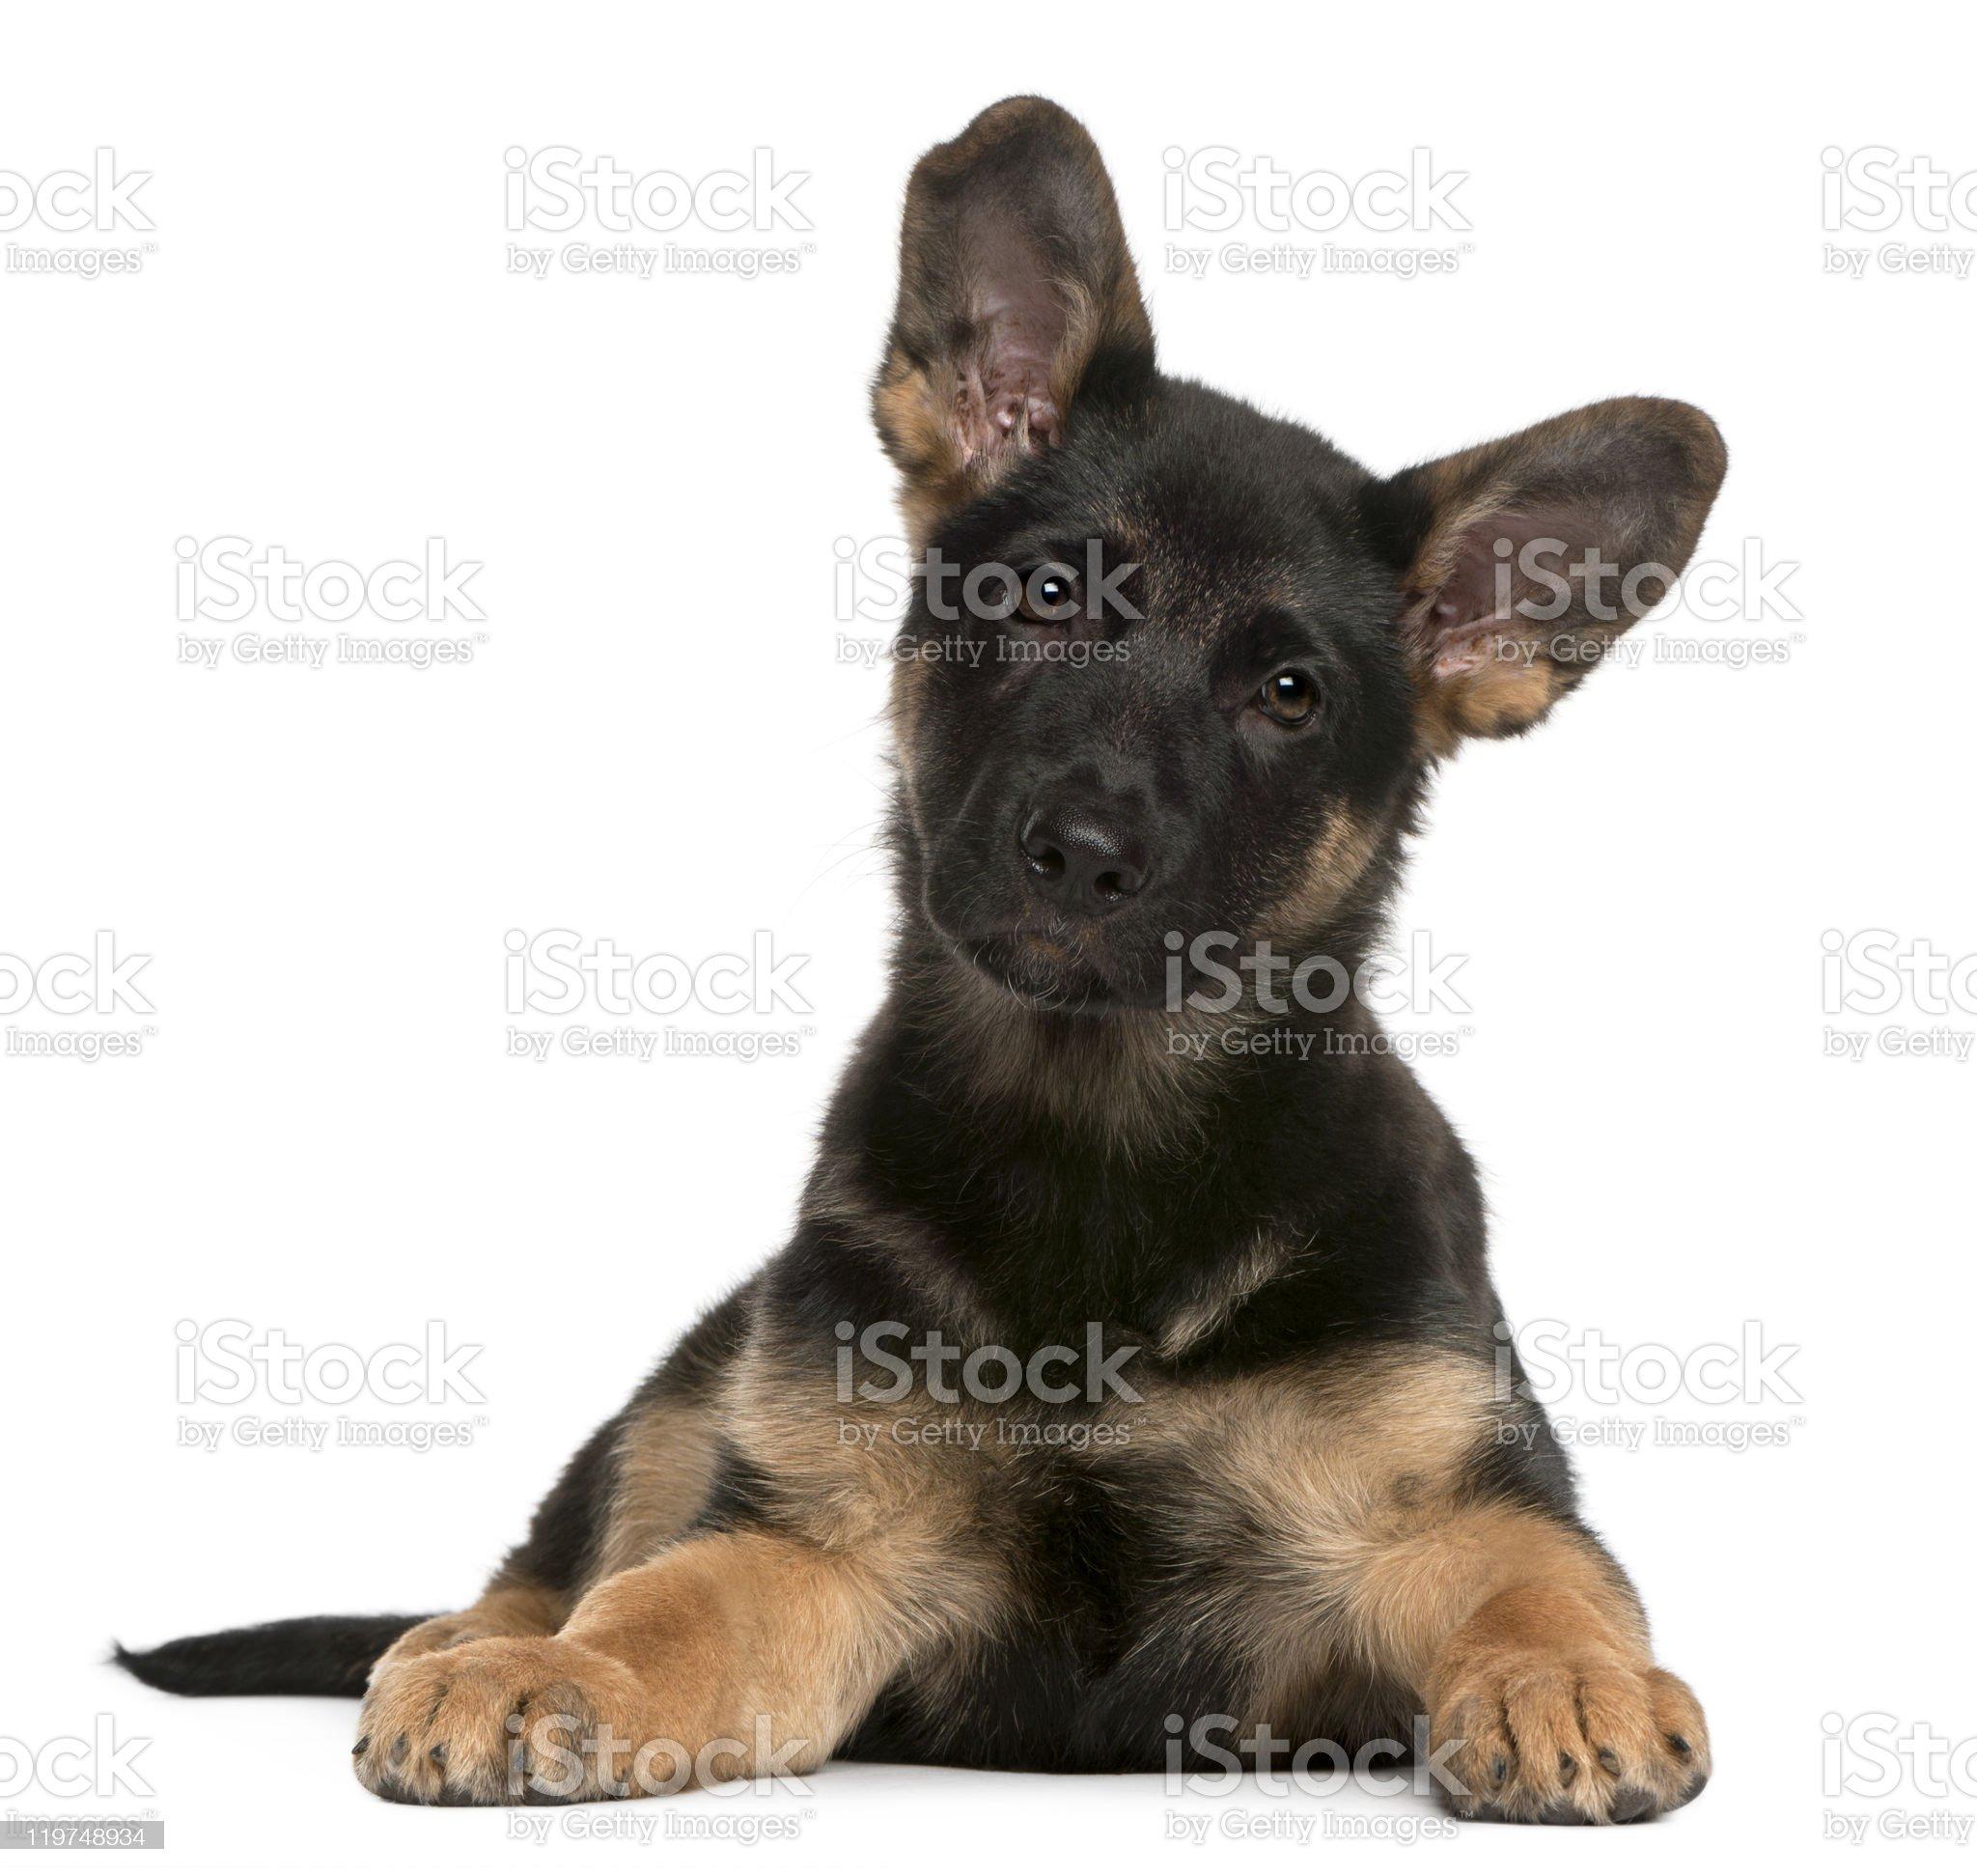 German Shepherd Dog puppy, 3 months old, lying, white background. royalty-free stock photo